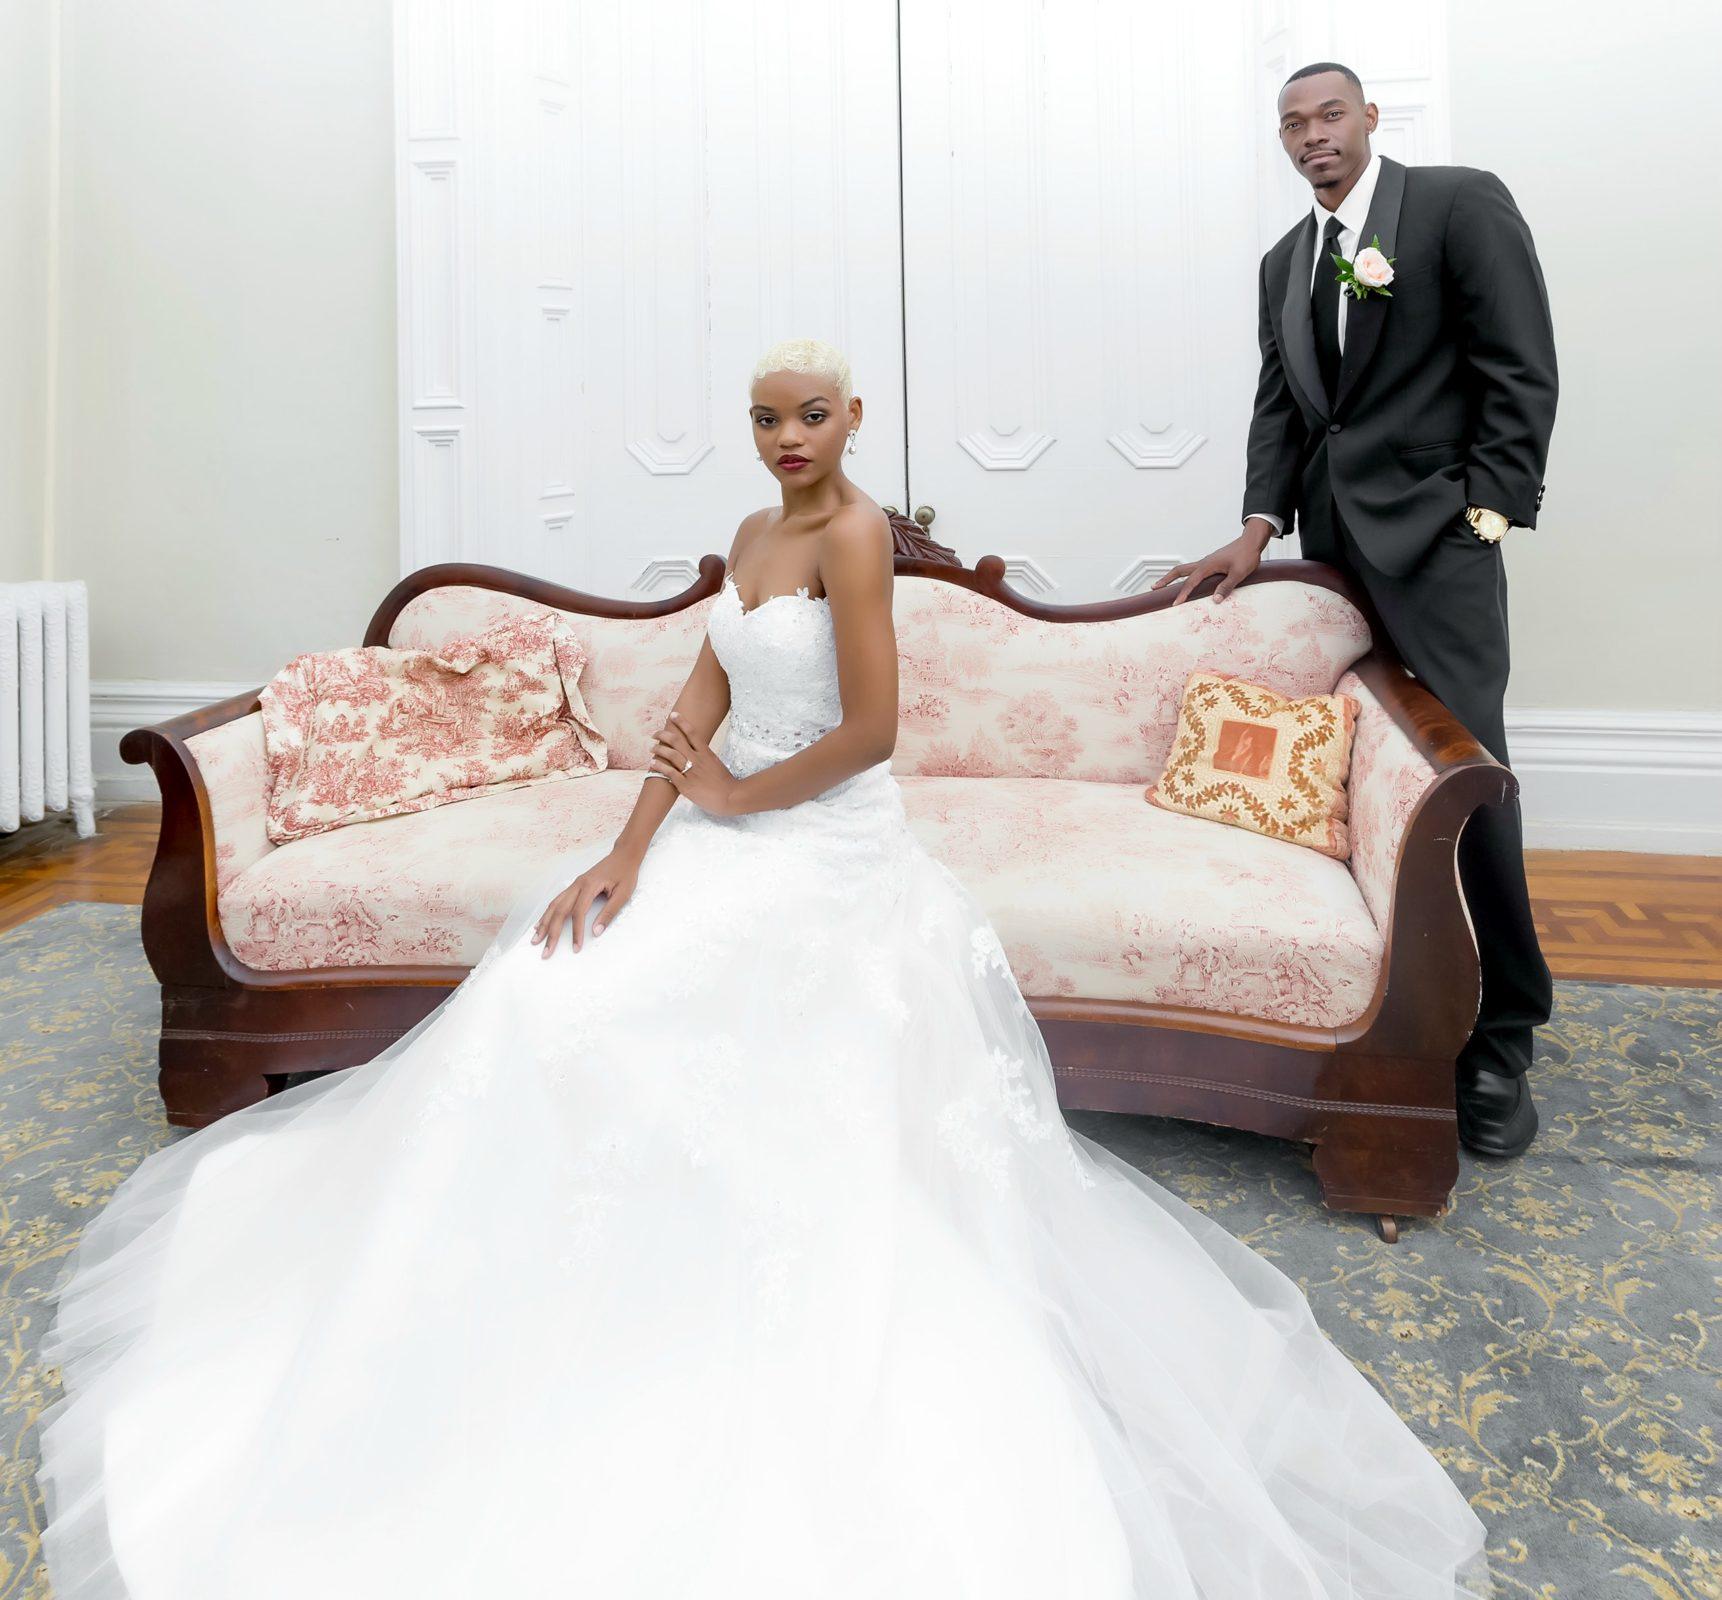 Vintage Weddings Archives - Black Nuptials